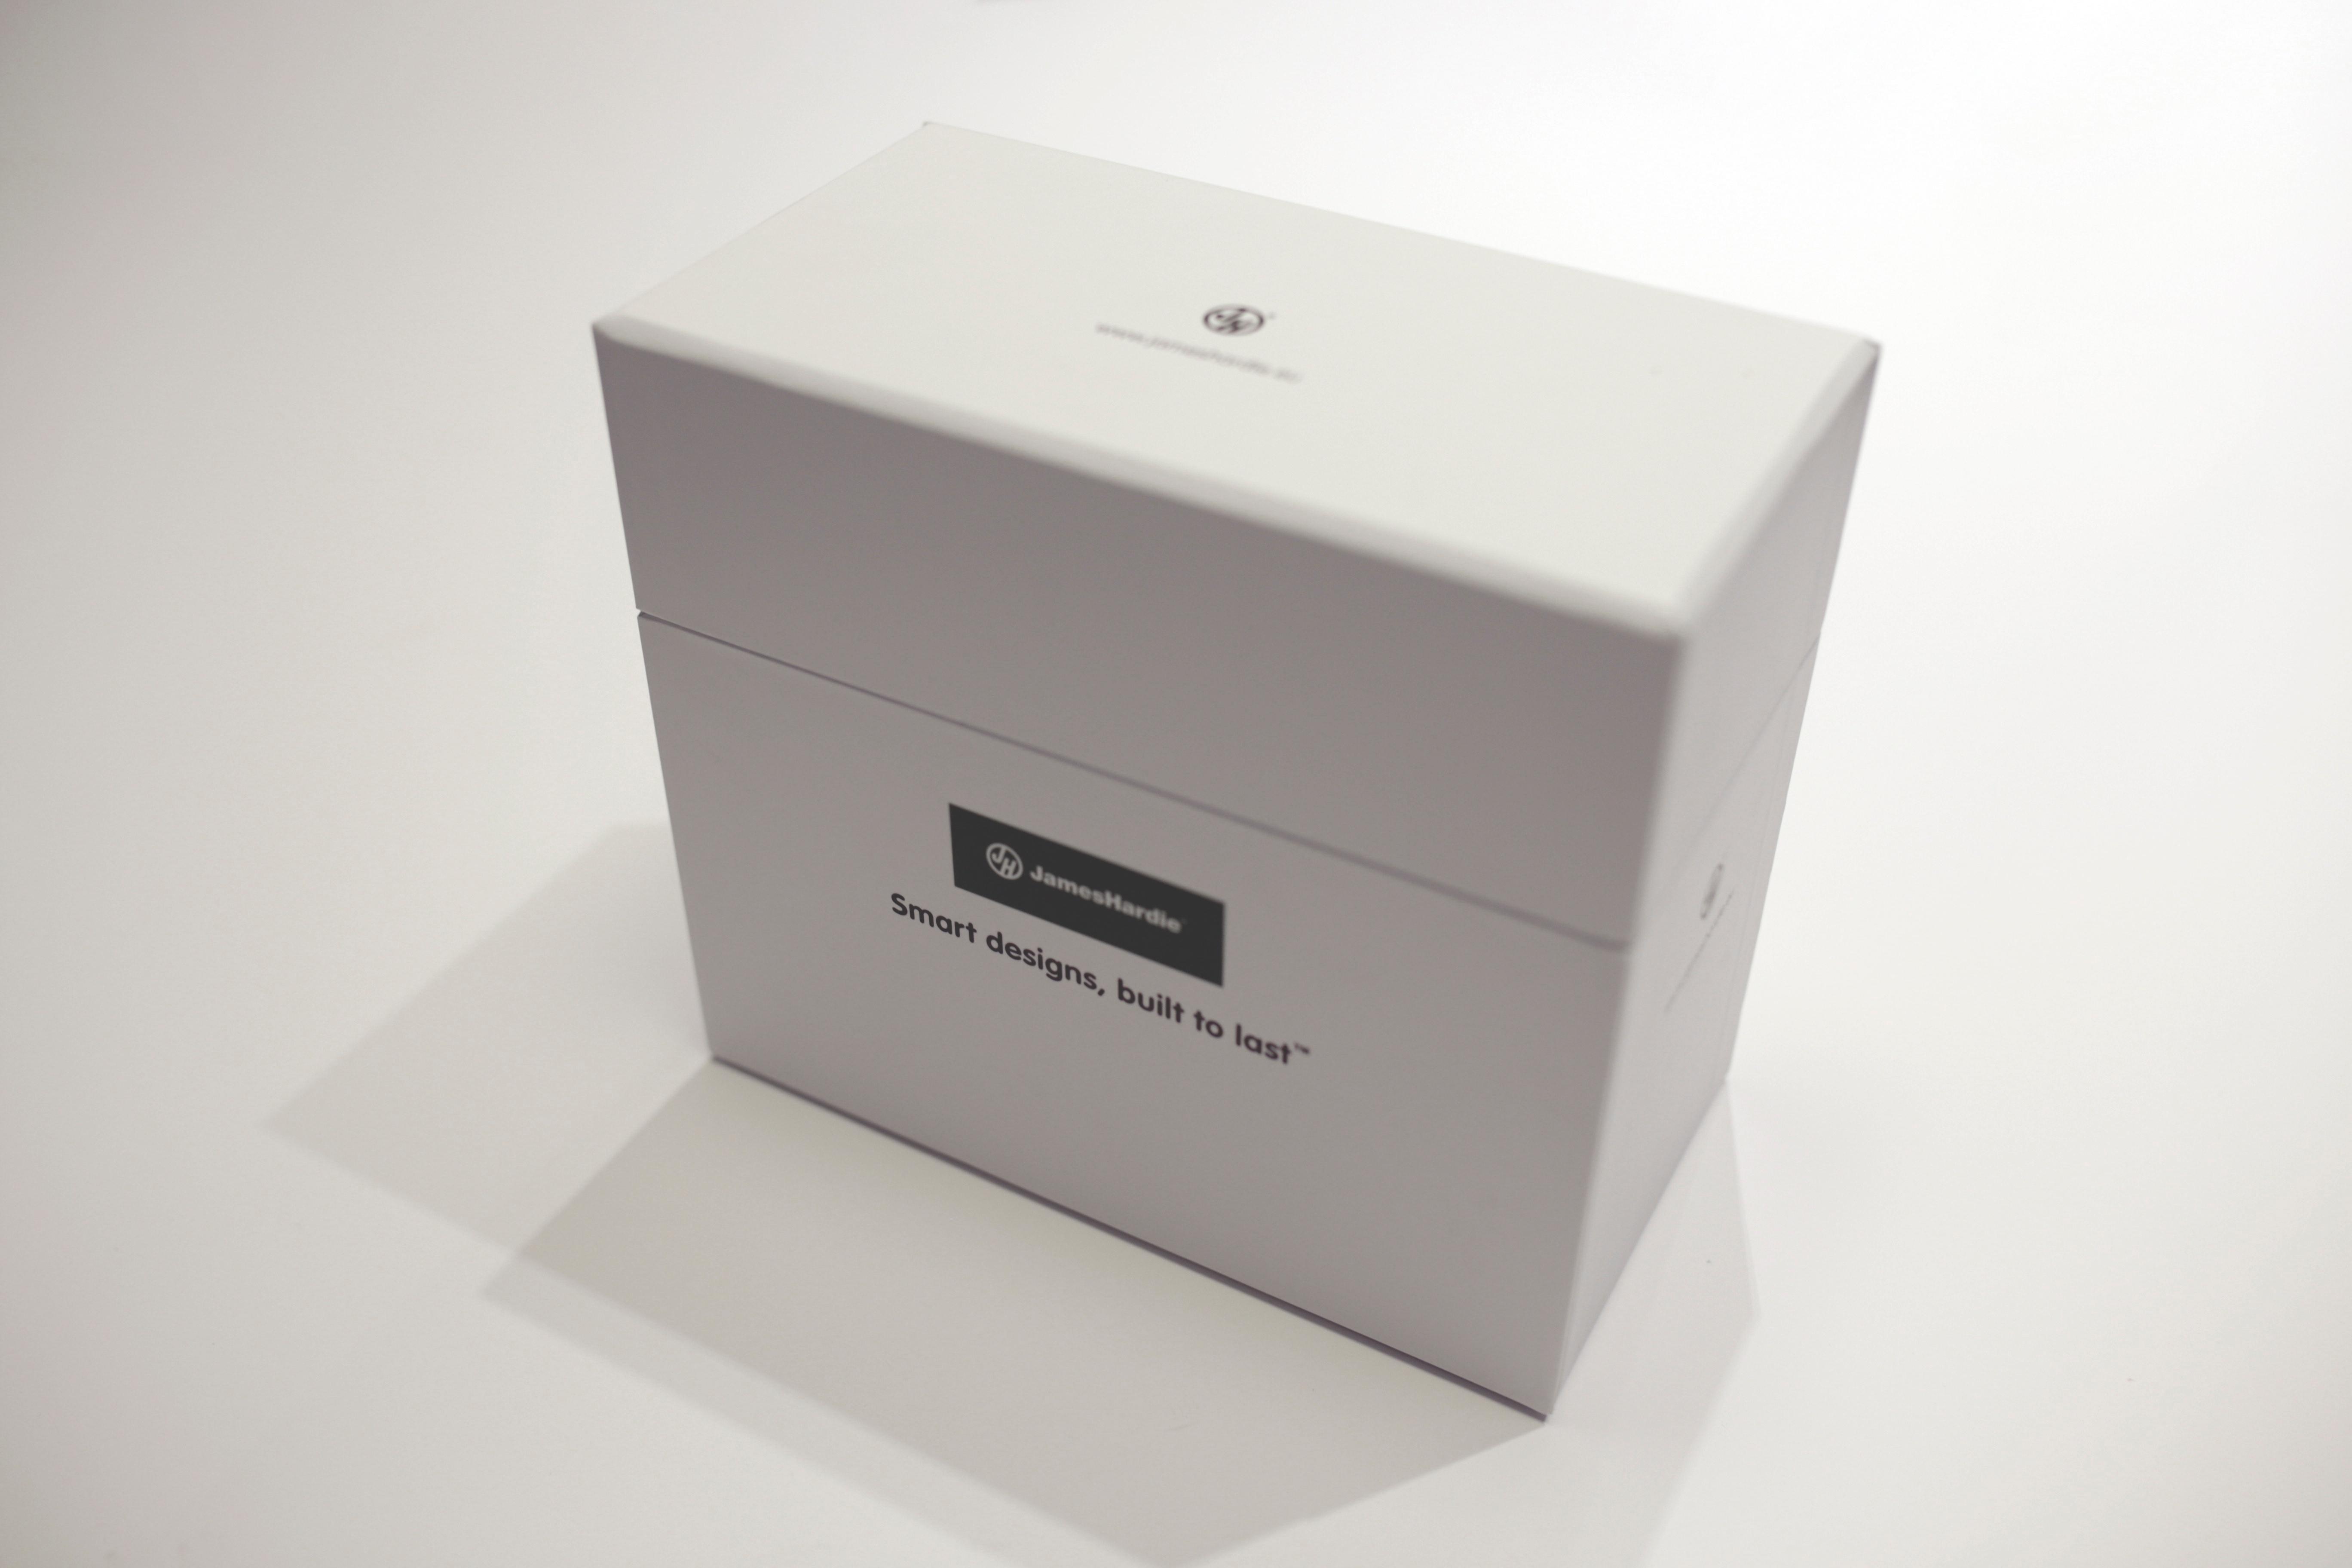 Image of James Hardie's closed sample box